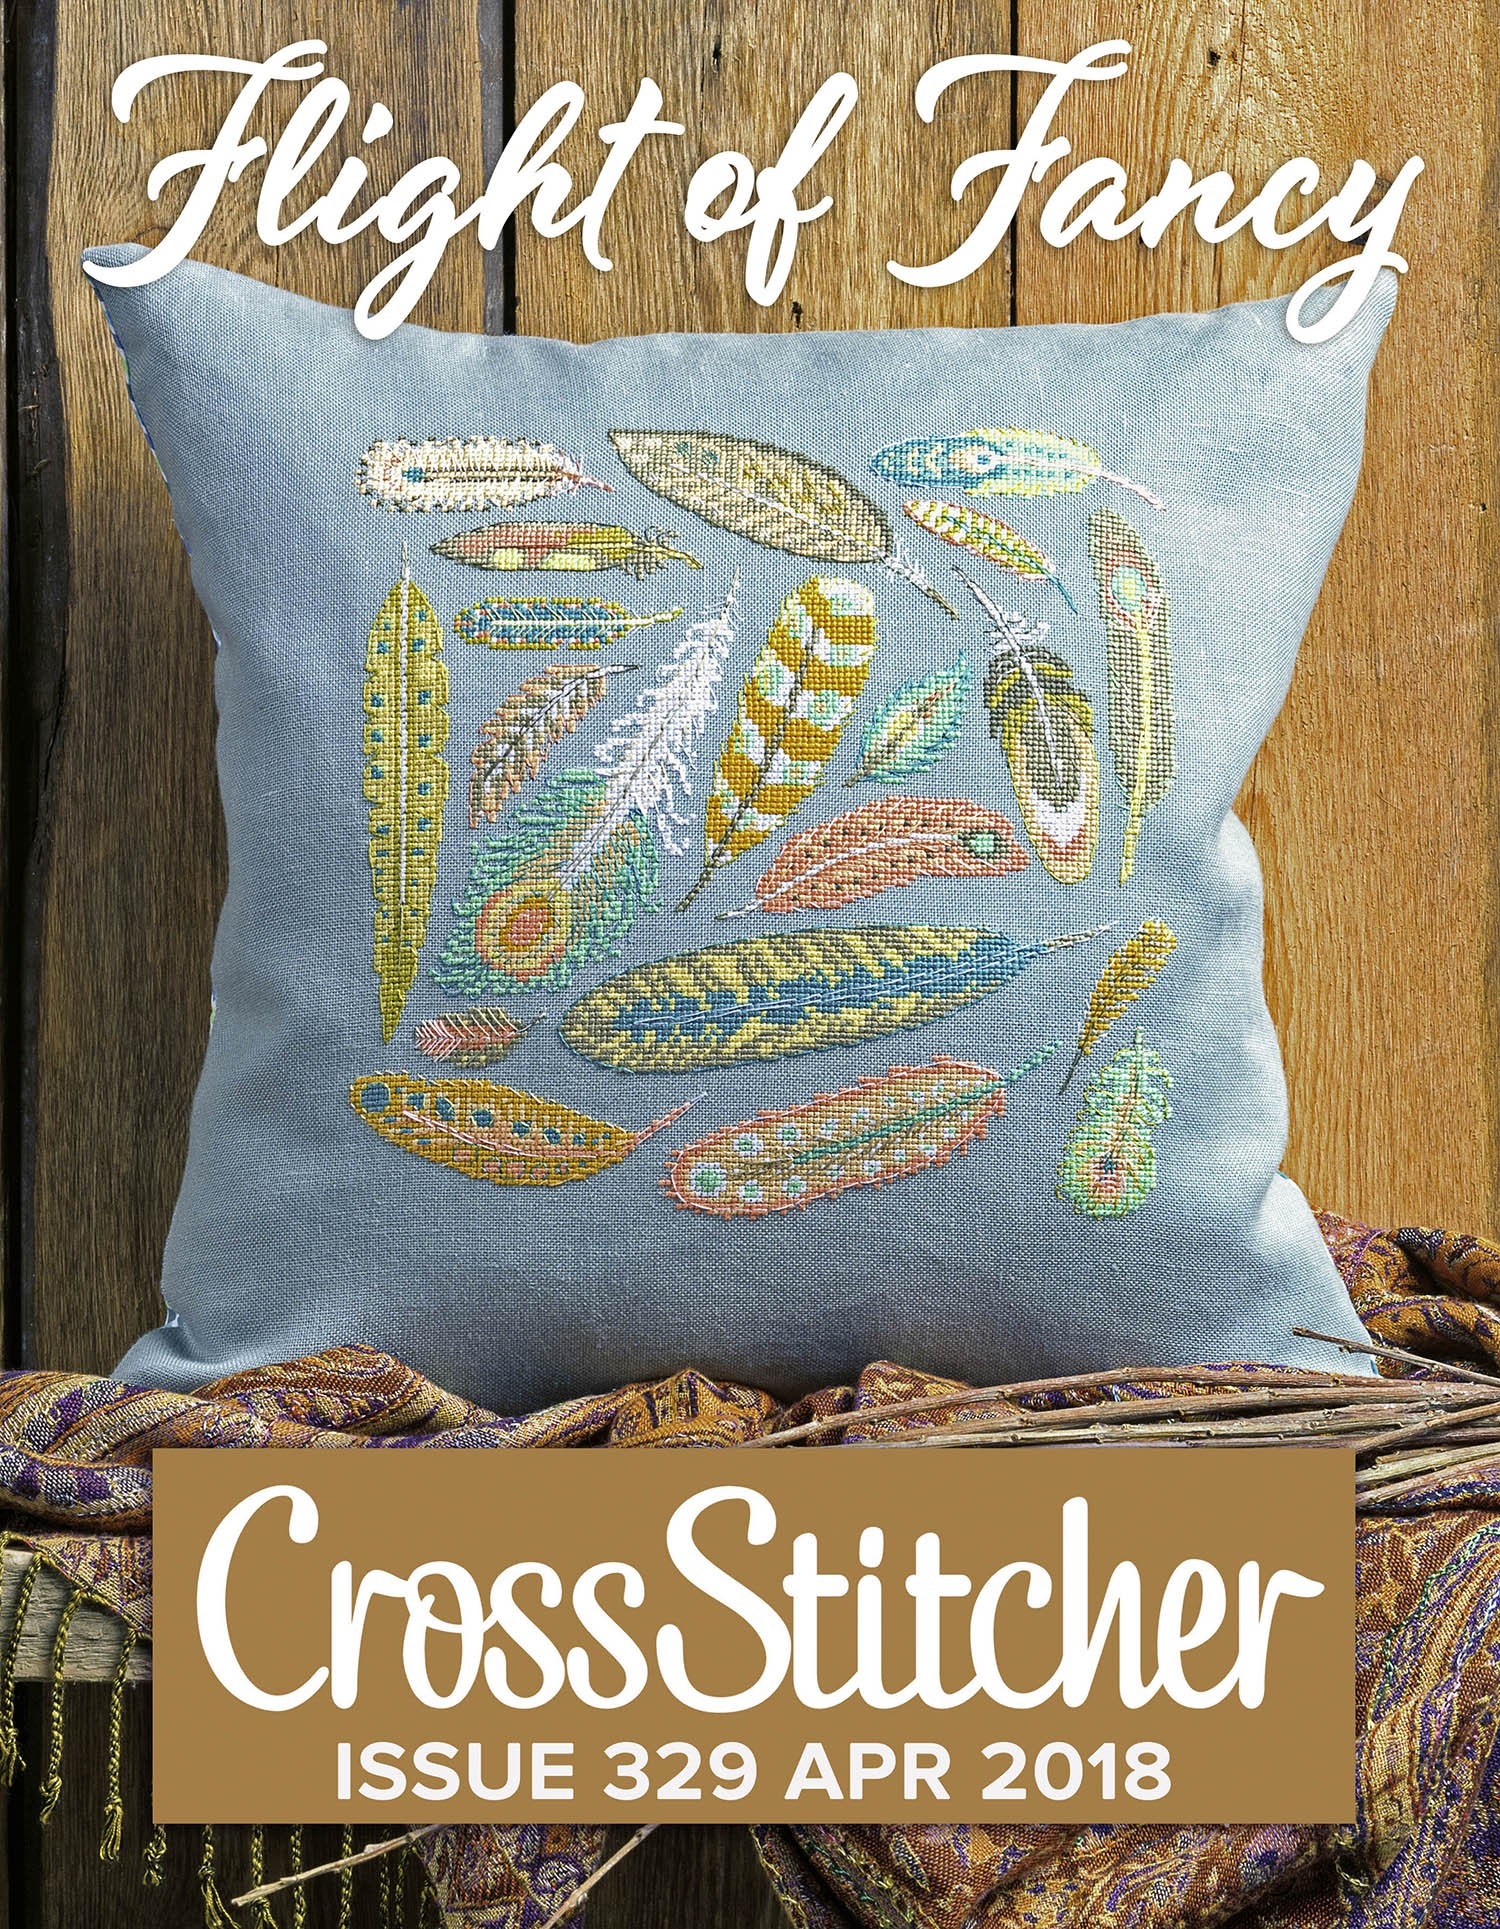 Cross Stitcher Project Pack - Flight of Fancy XST329